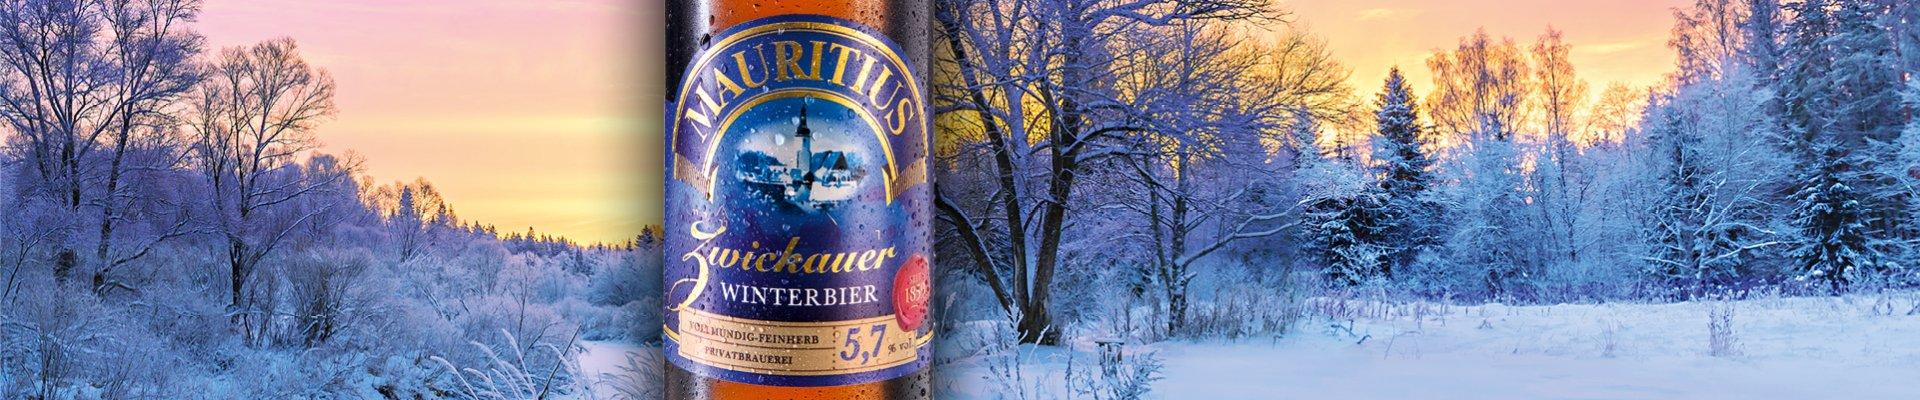 Mauritius: Biere: Winterbier